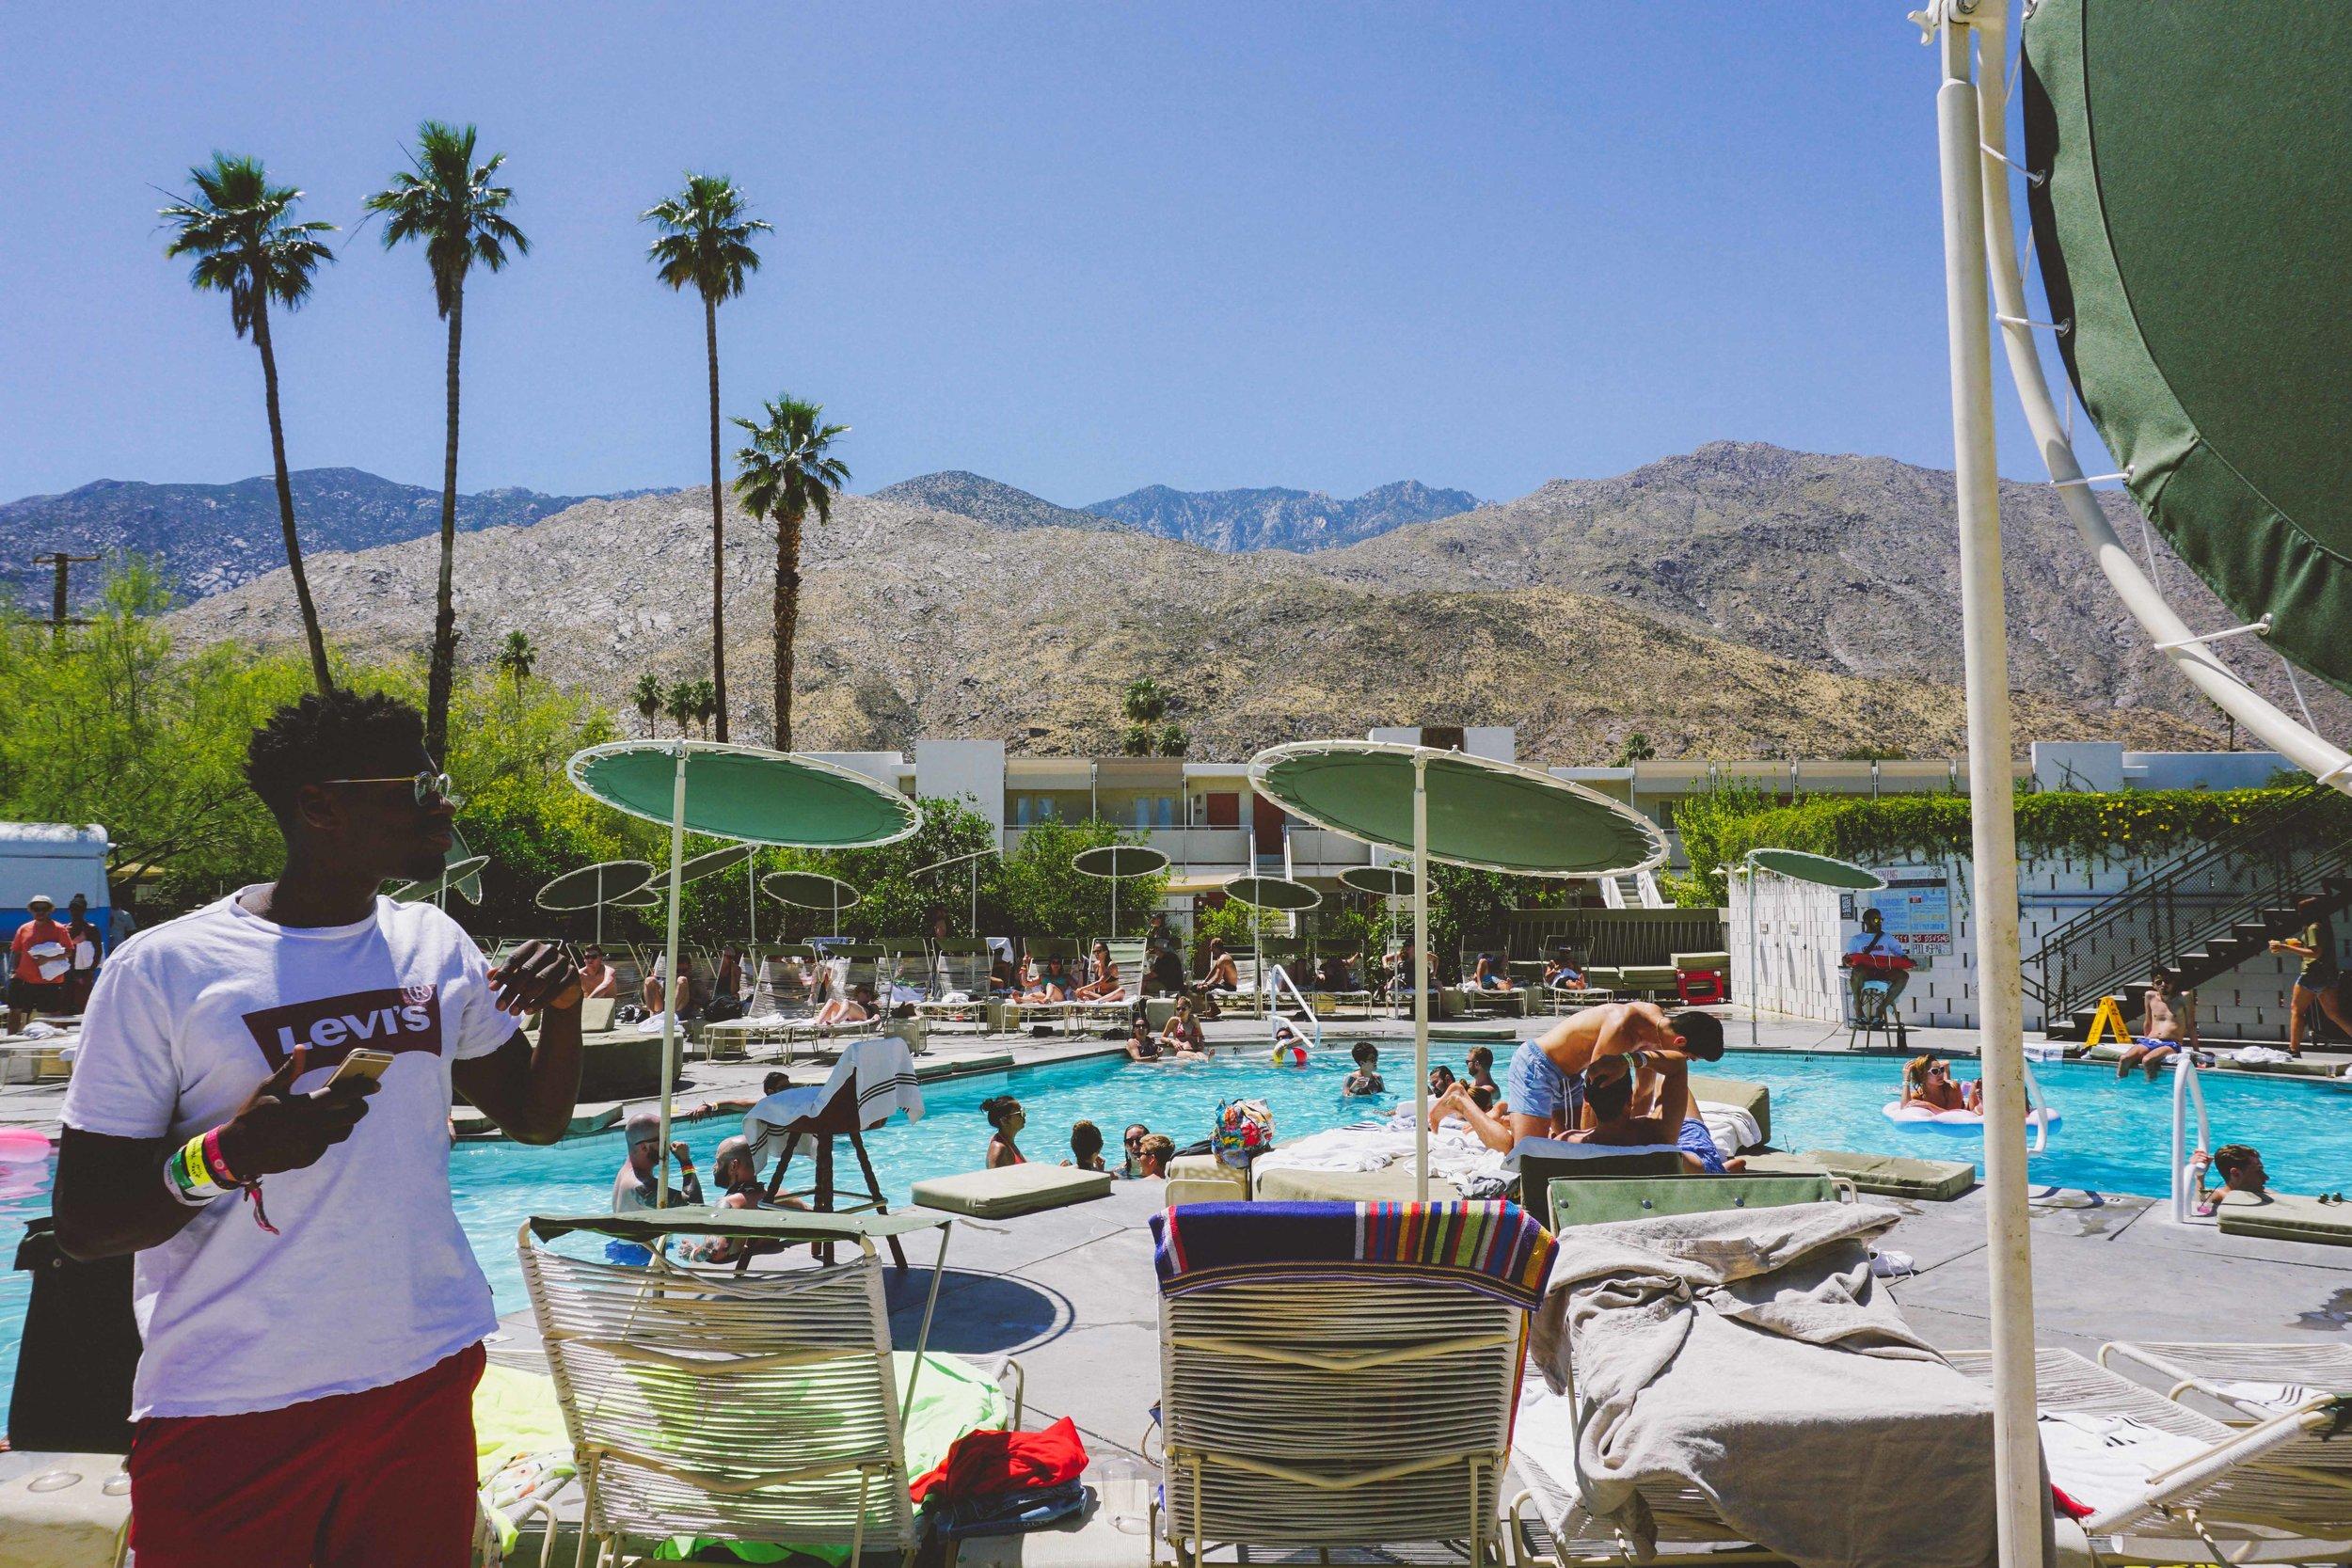 ACE Hotel Palm Springs, Accommodation Coachella Festival